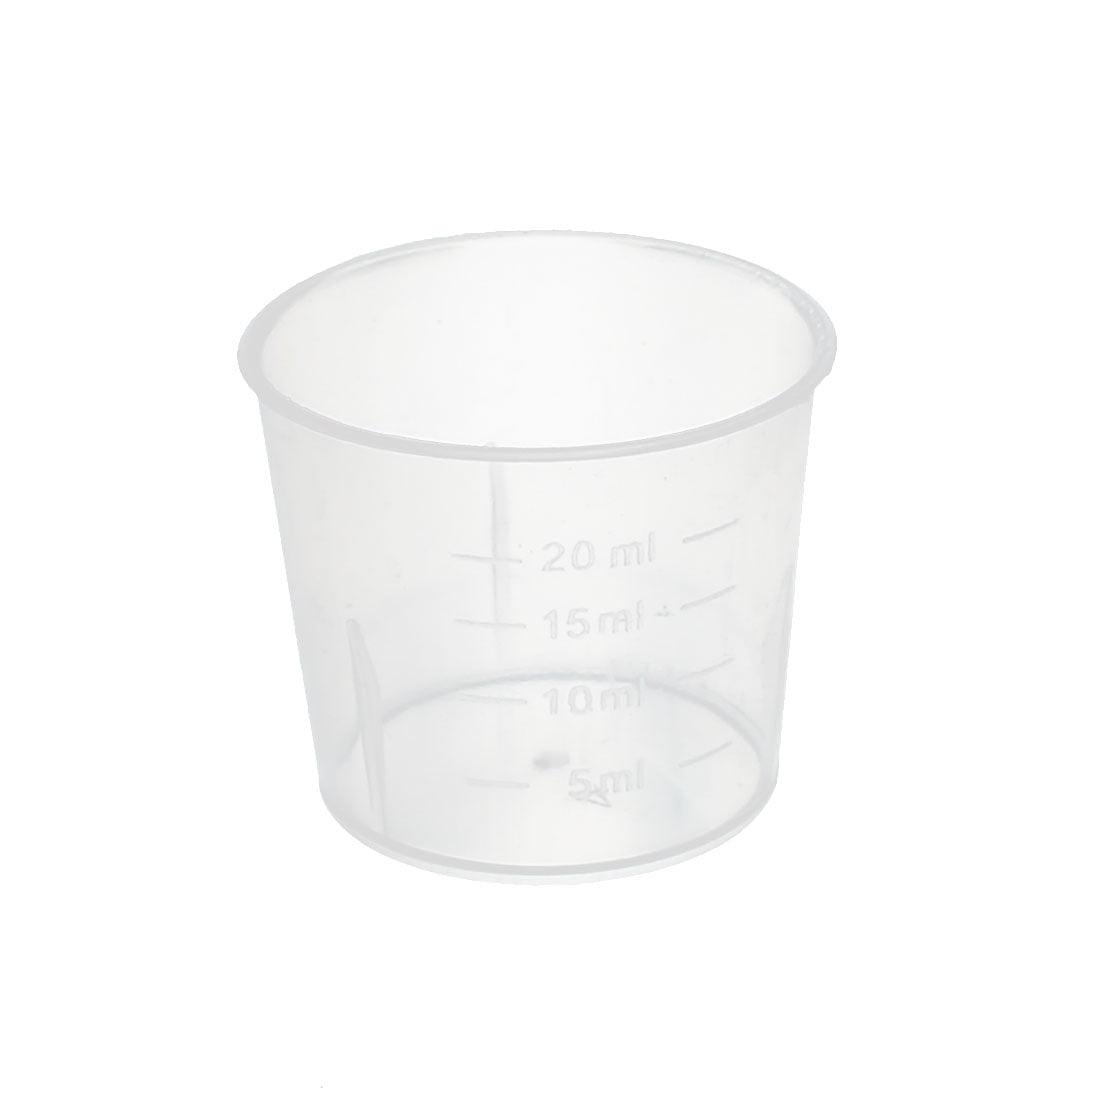 20mL School Laboratory Transparent Plastic Liquid Container Measuring Cup Beaker by Unique-Bargains